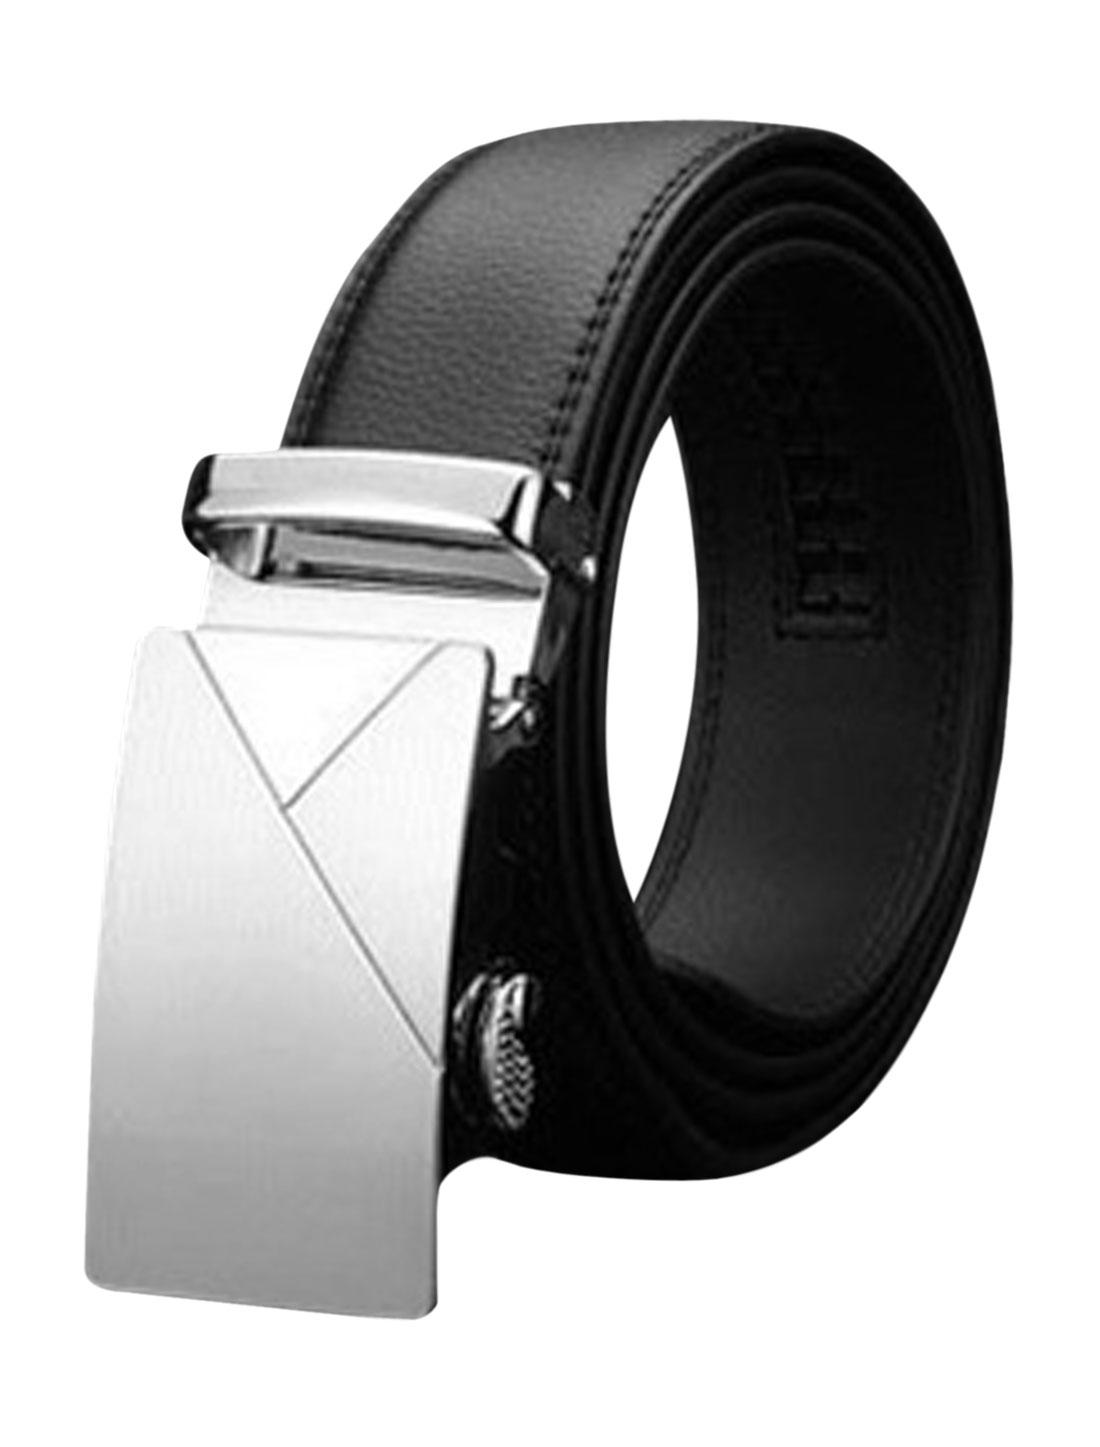 Men Automatic Buckle Holeless Stitching PU Leather Ratchet Belt Black 120CM